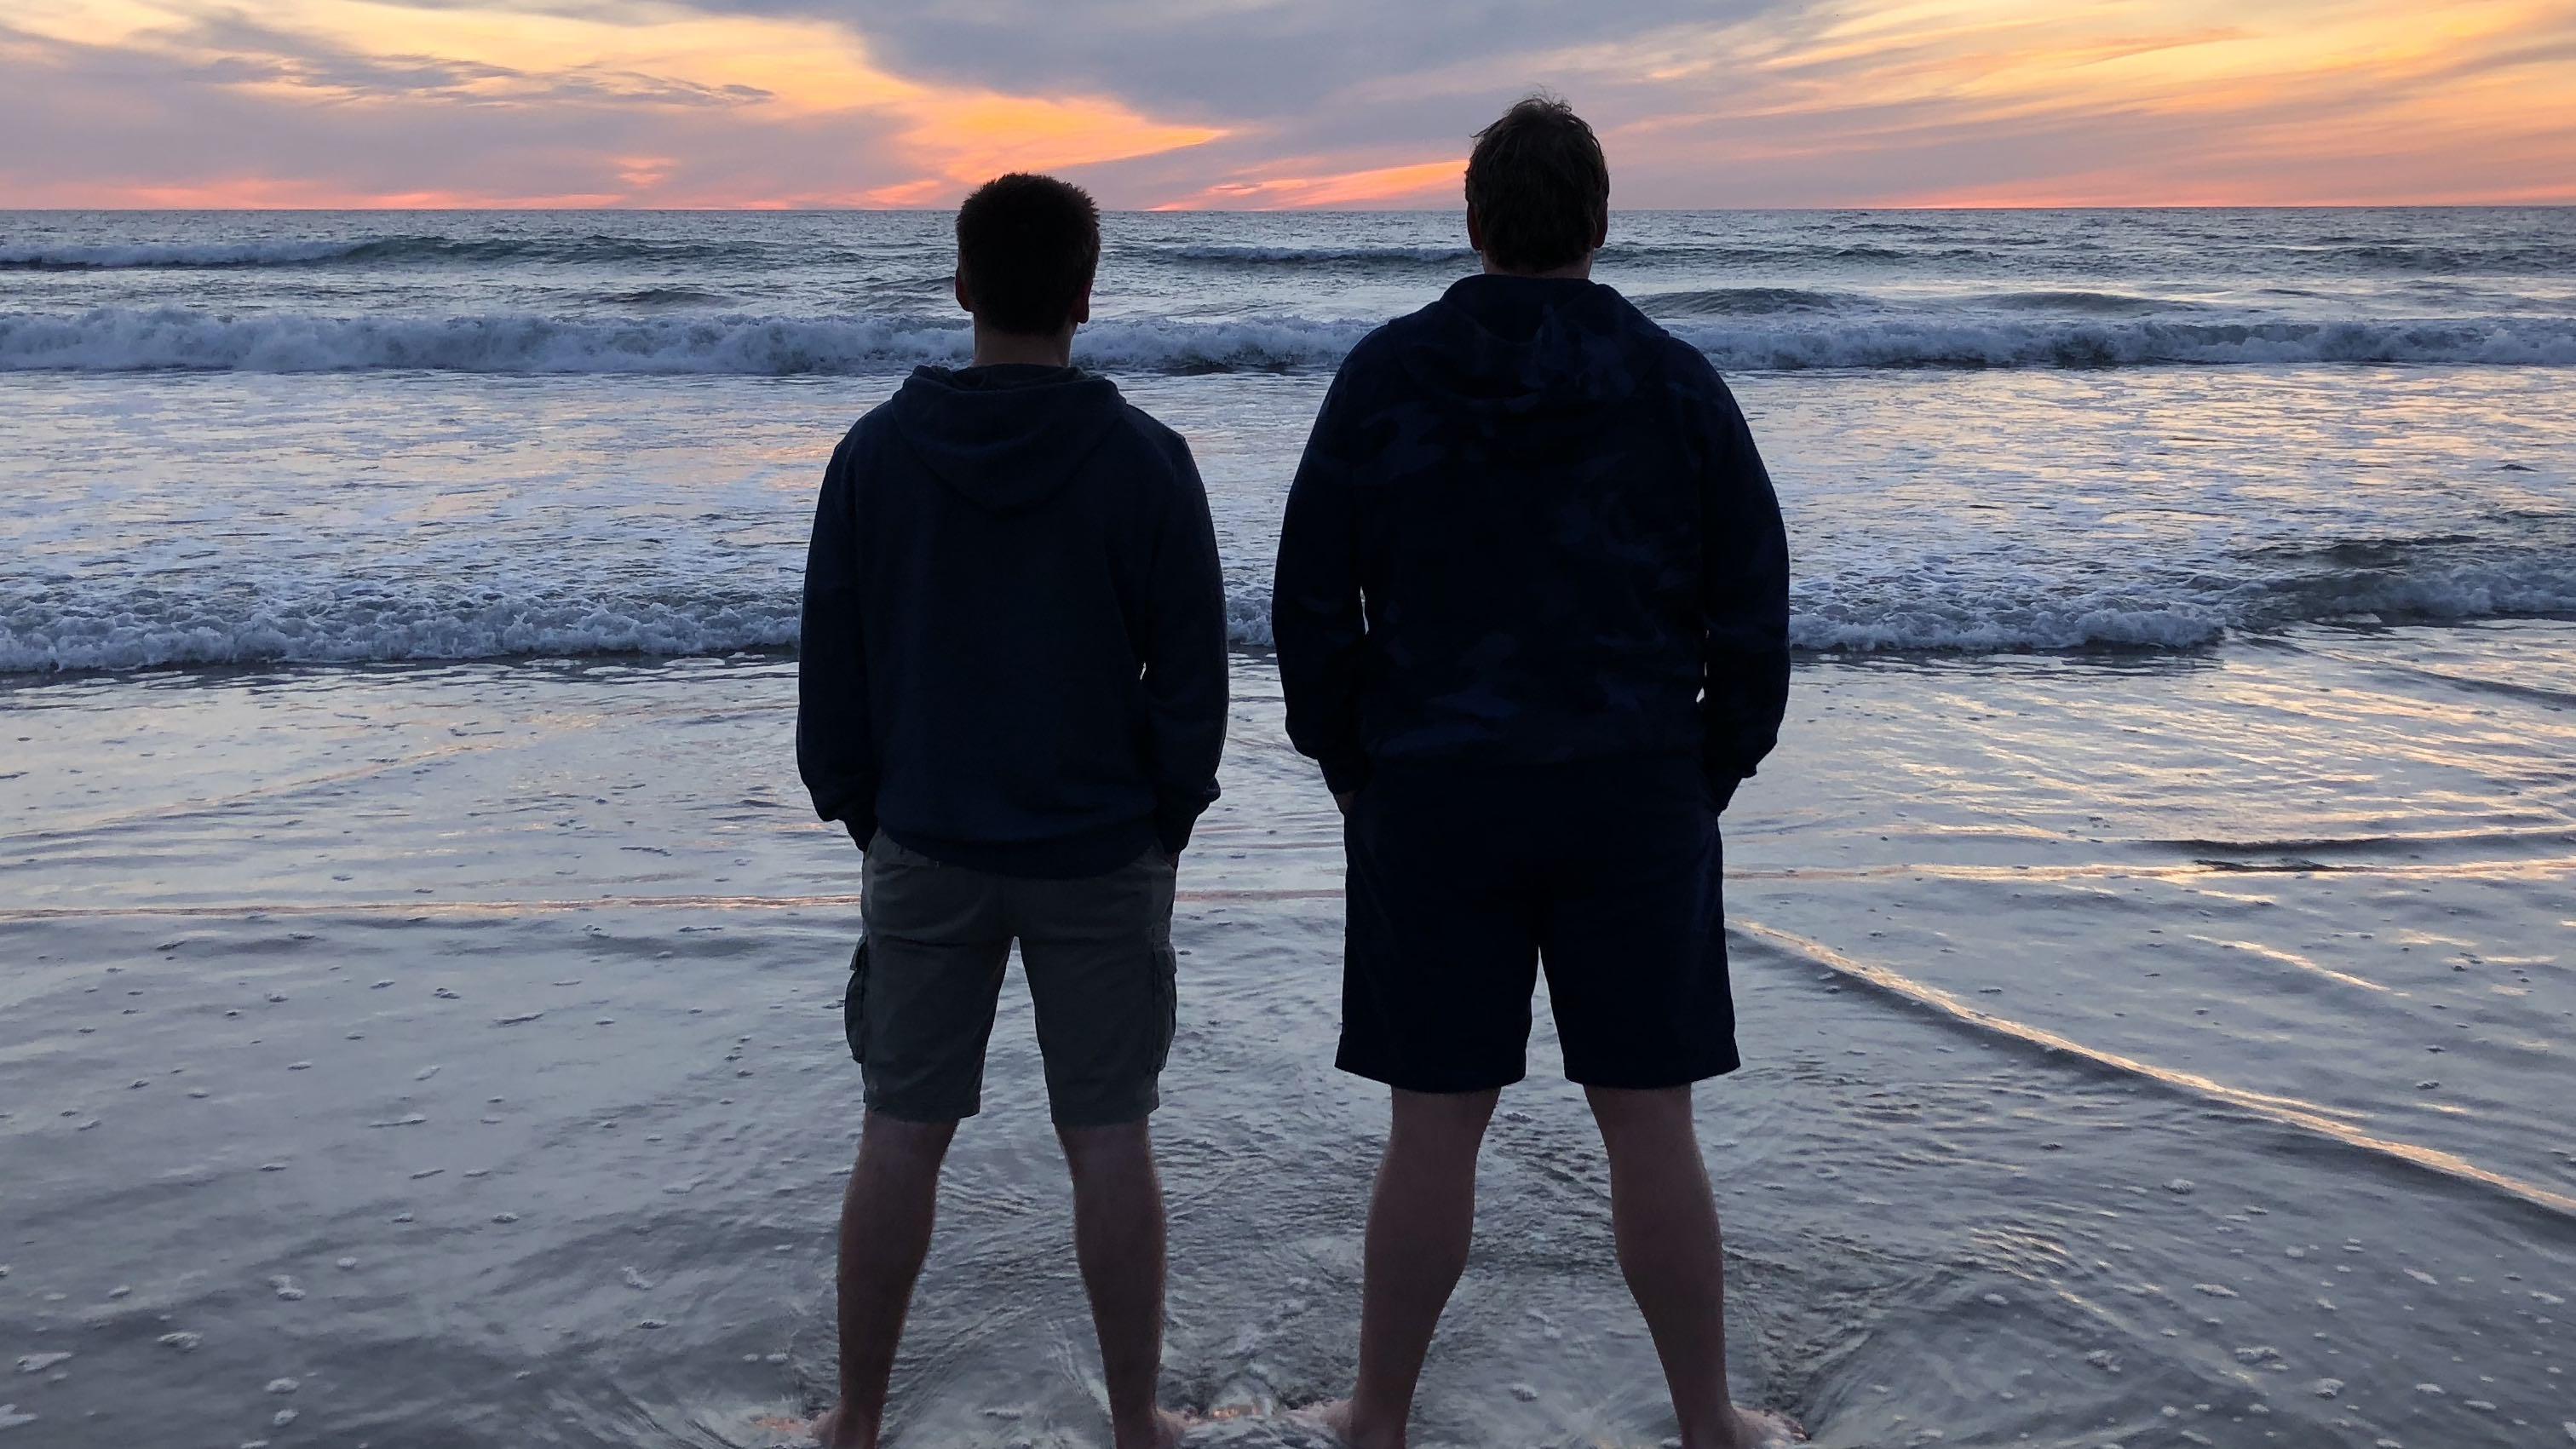 Sebastien Debaenst and Eelco de Boer San Diego Sunset